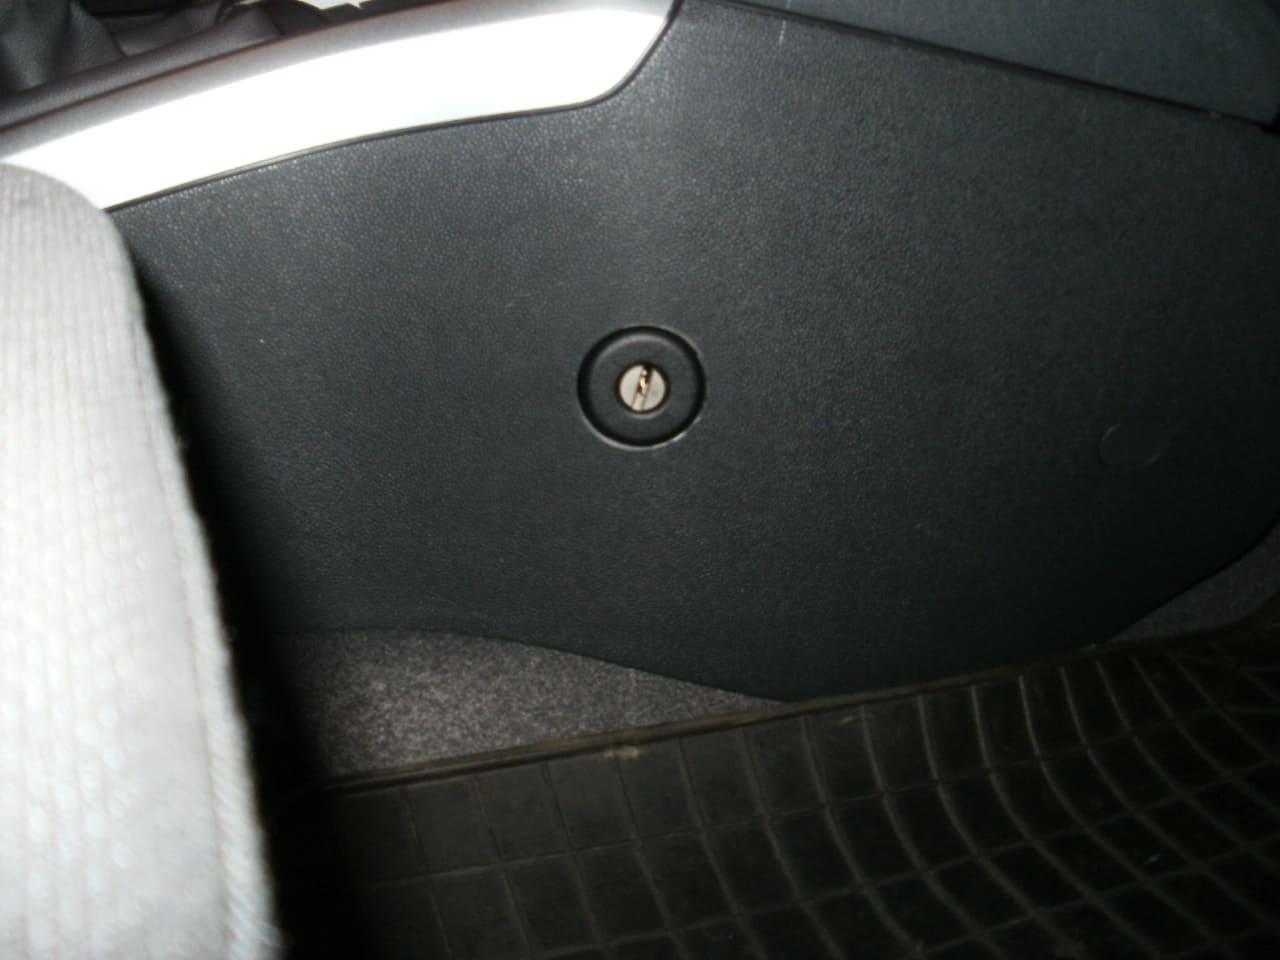 замок на кпп констракт Opel Vectra